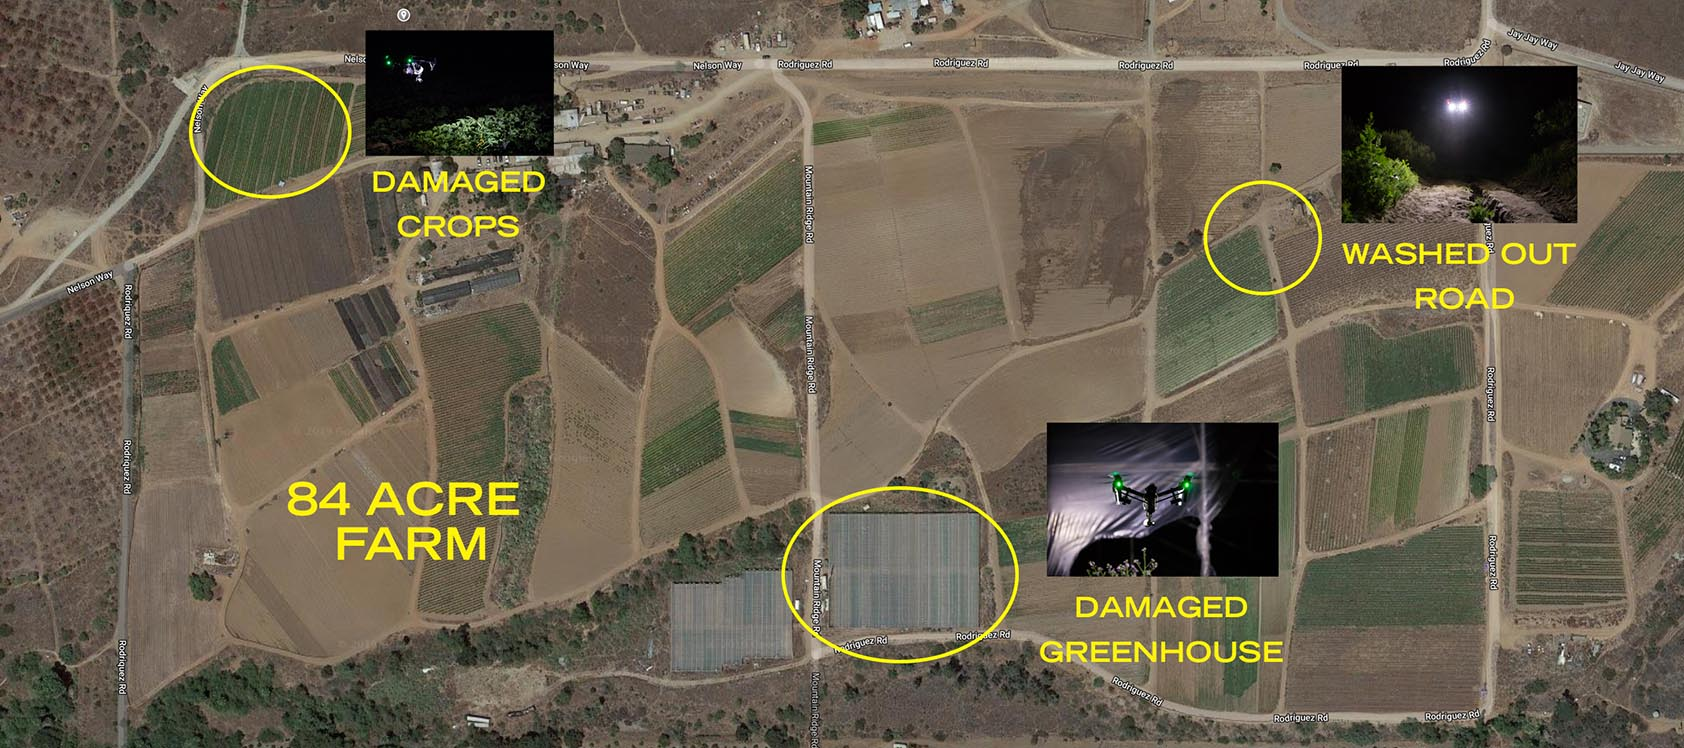 FARM_OVERHEAD_DAMAGE_DIAGRAM